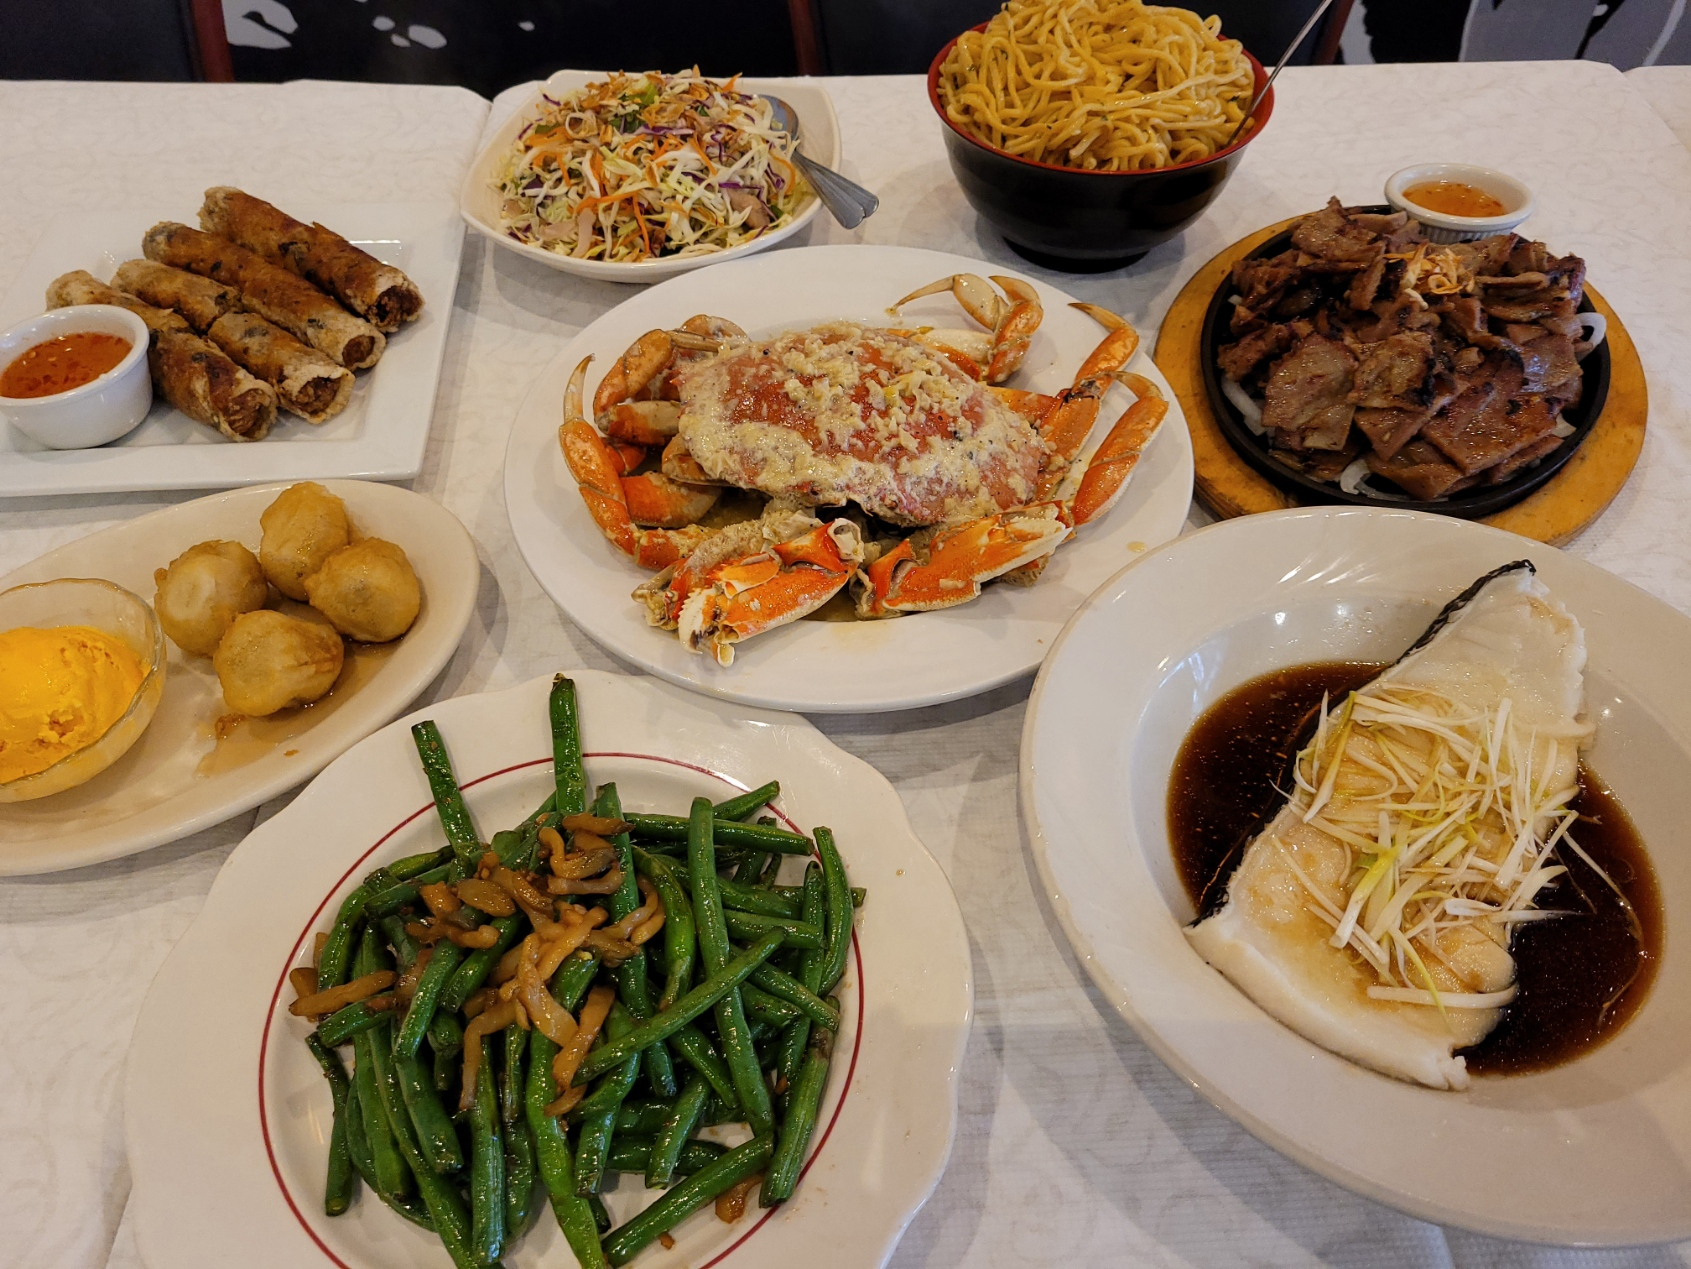 Crab Dinner for 4